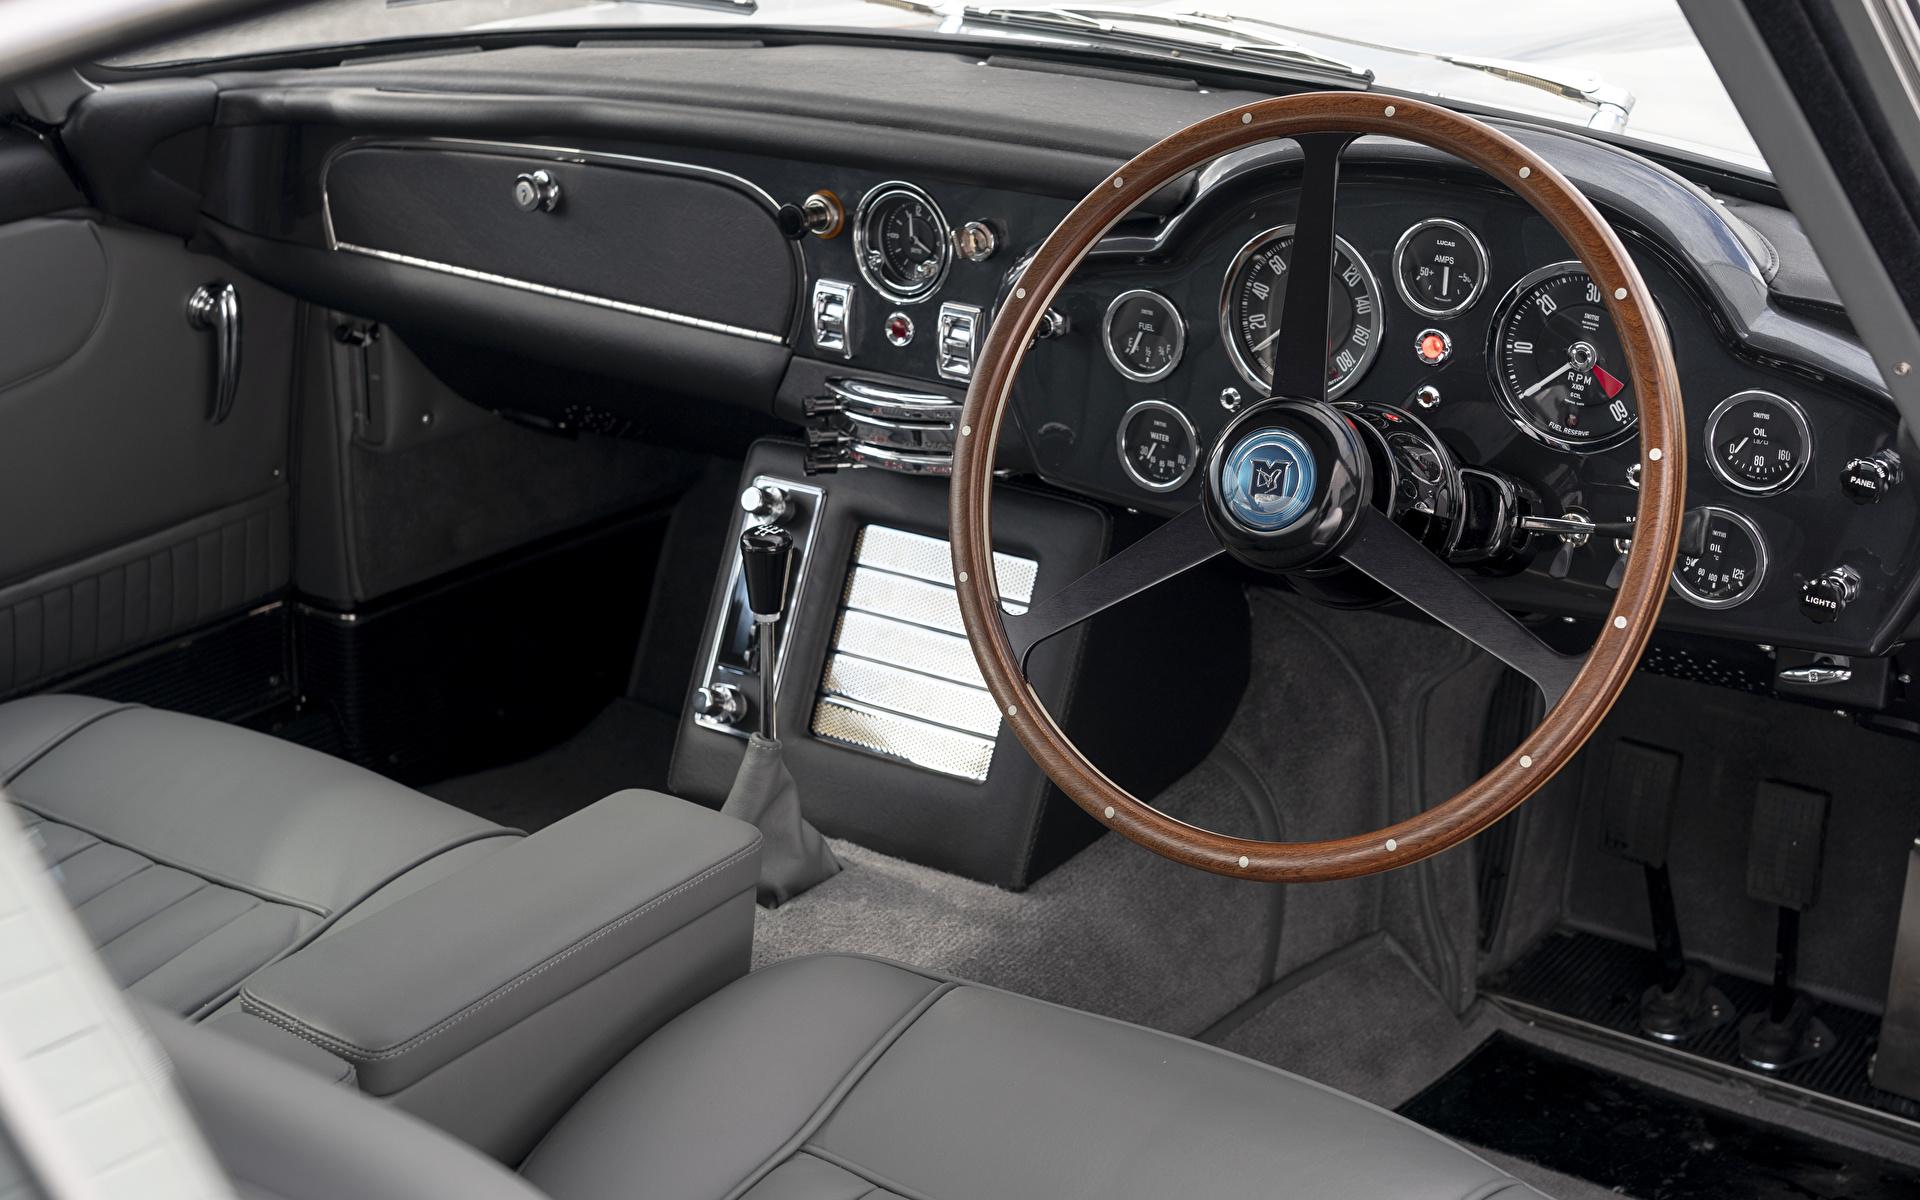 Bilde Salons Aston Martin Bil ratt DB5 Goldfinger Continuation, 2020 Biler 1920x1200 bil automobil